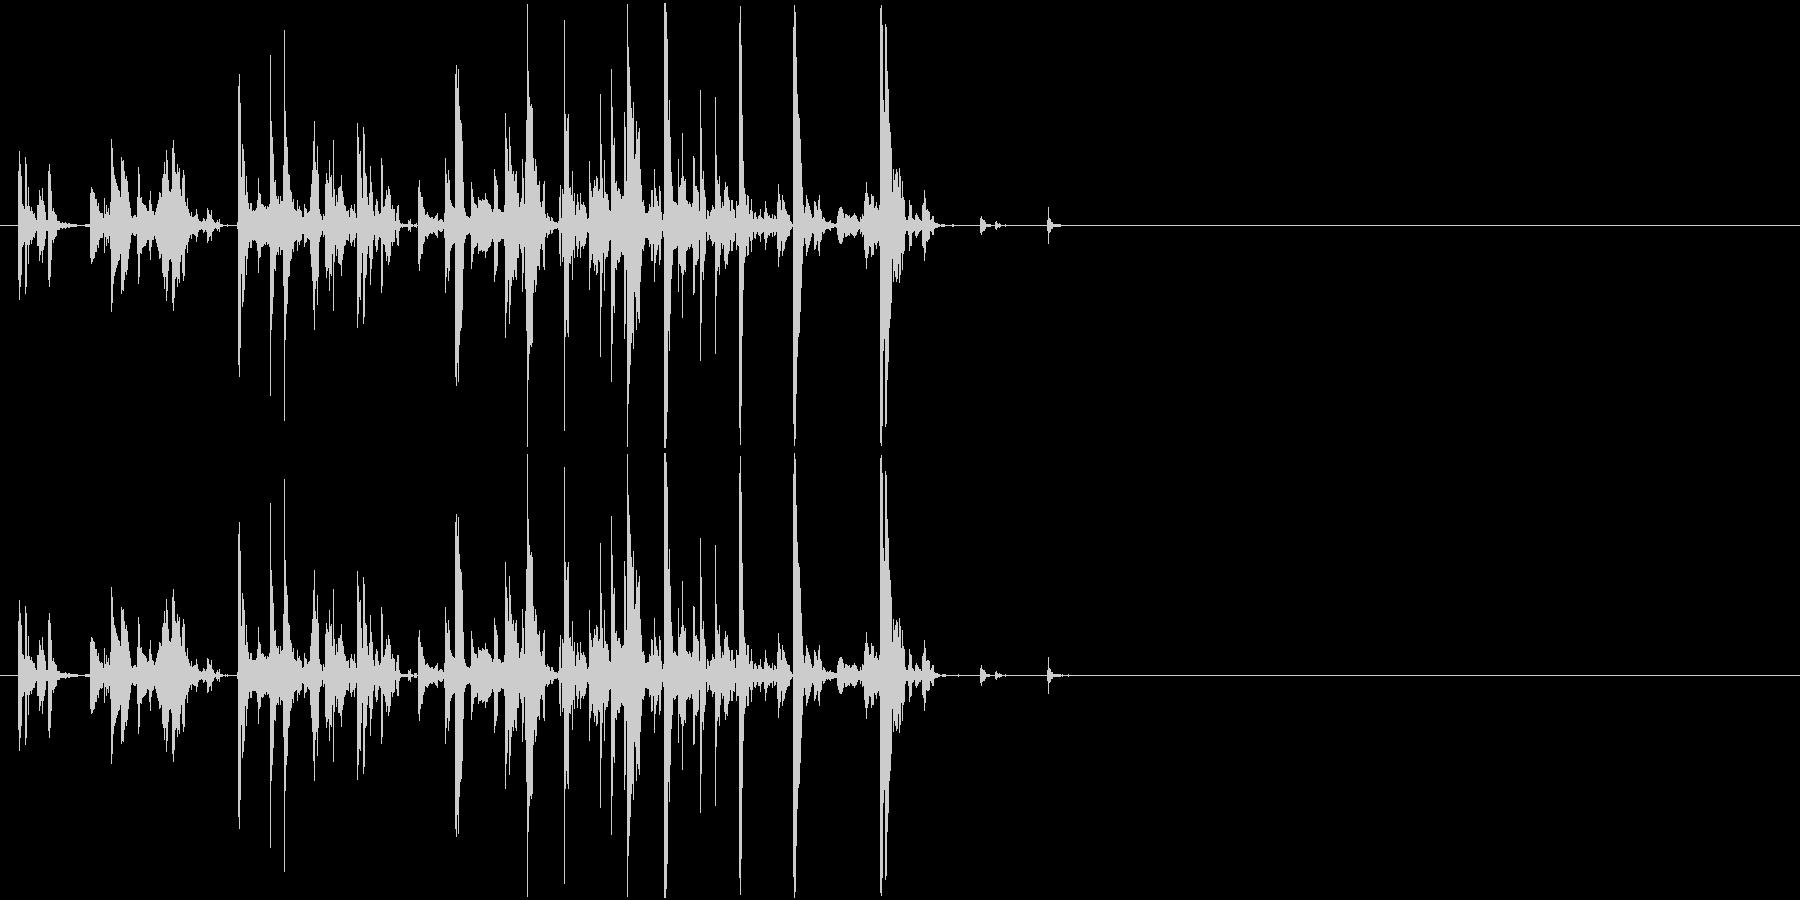 Suzu 鈴の音色 猫の首輪 ペットの未再生の波形